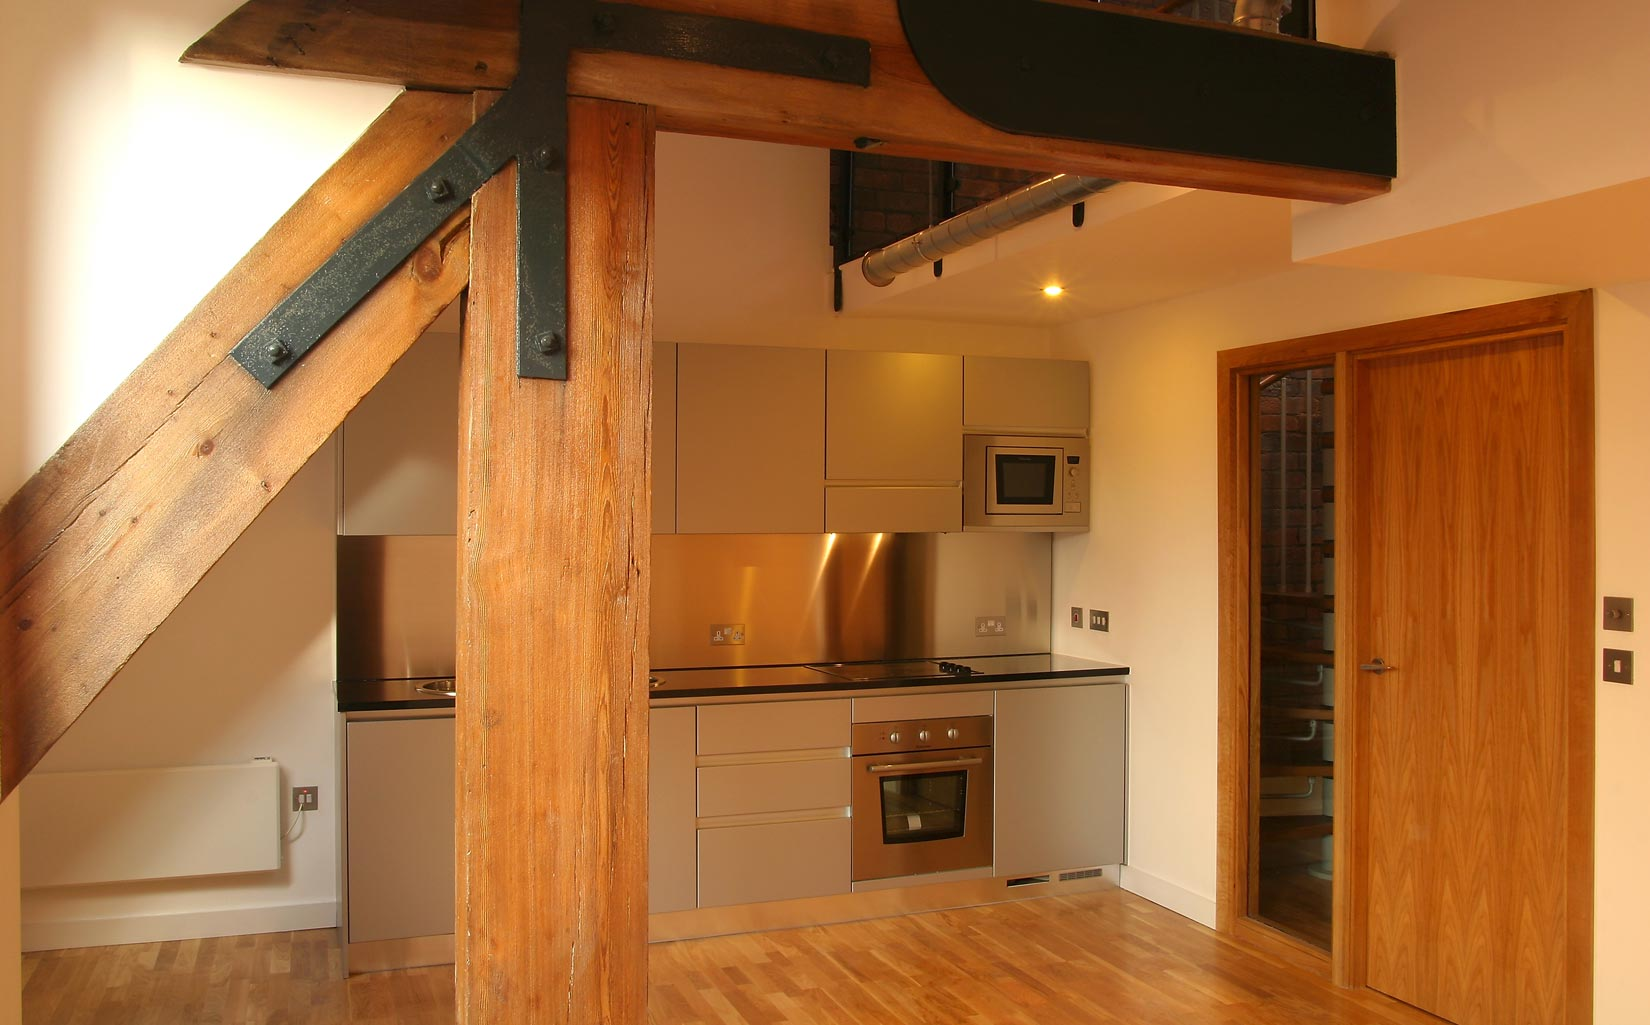 Roberts Wharf, Leeds, Interior Living Space